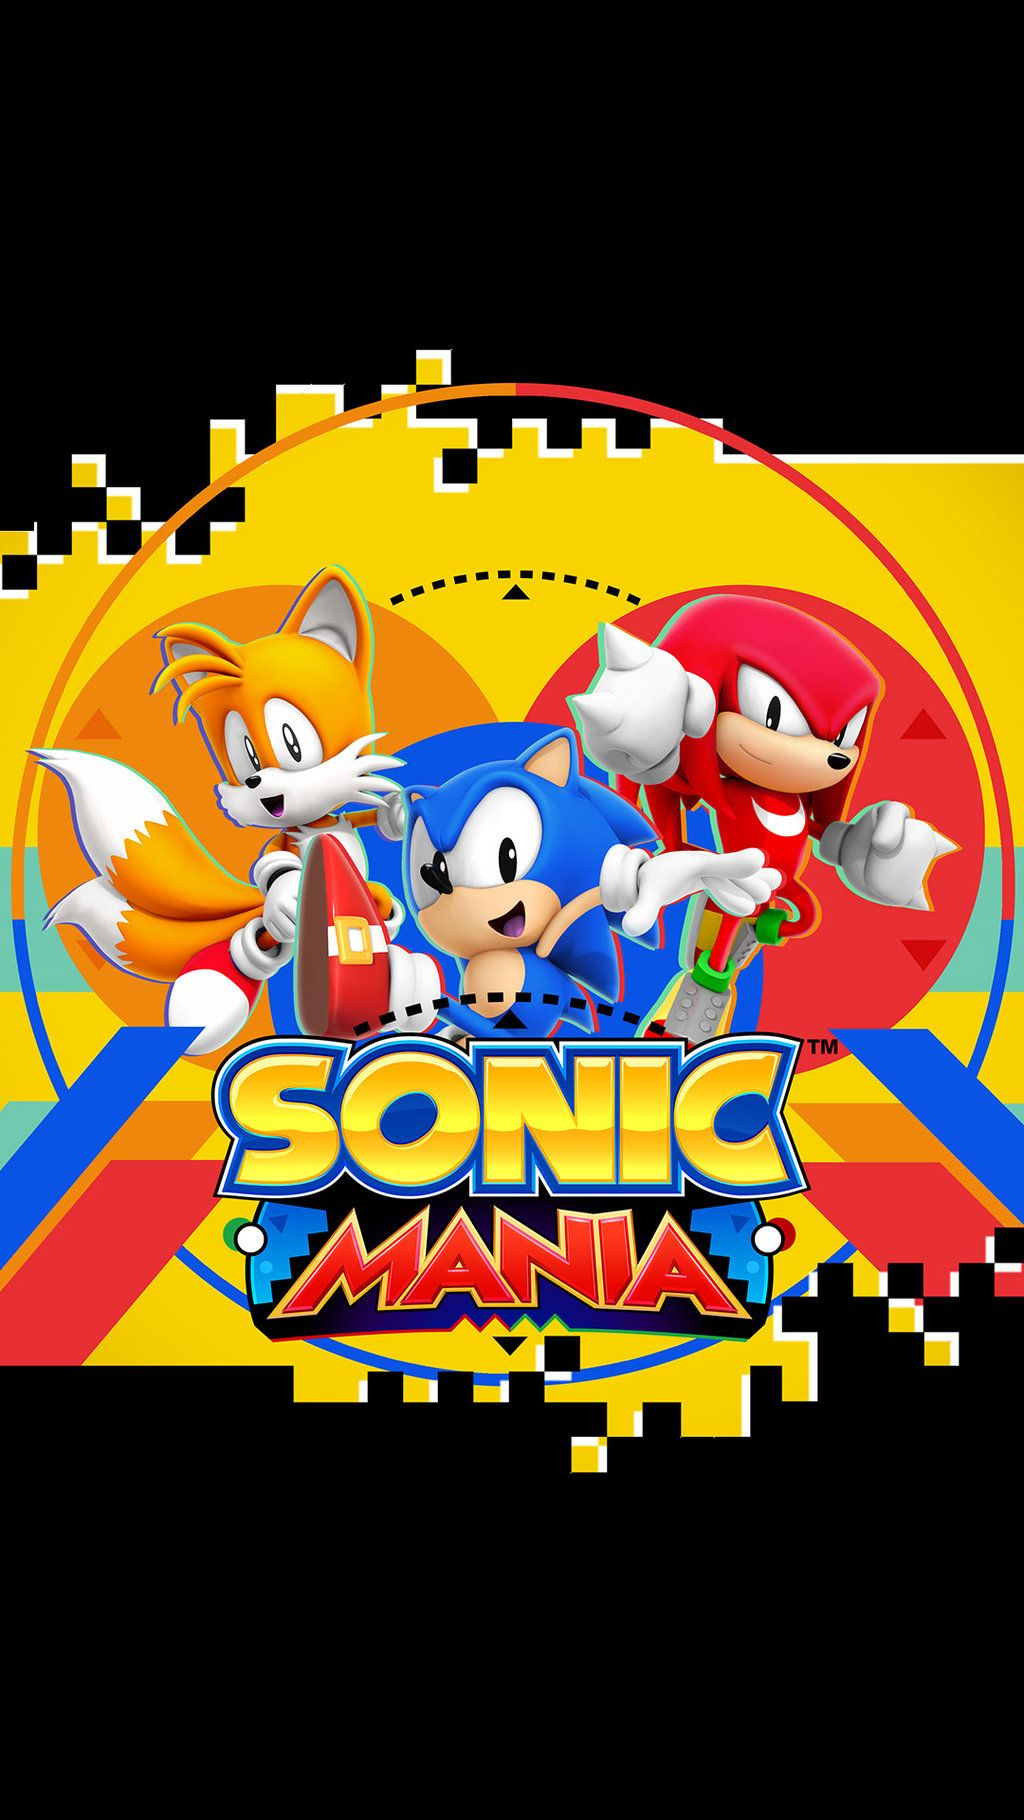 sonic mania wallpaper for mobile